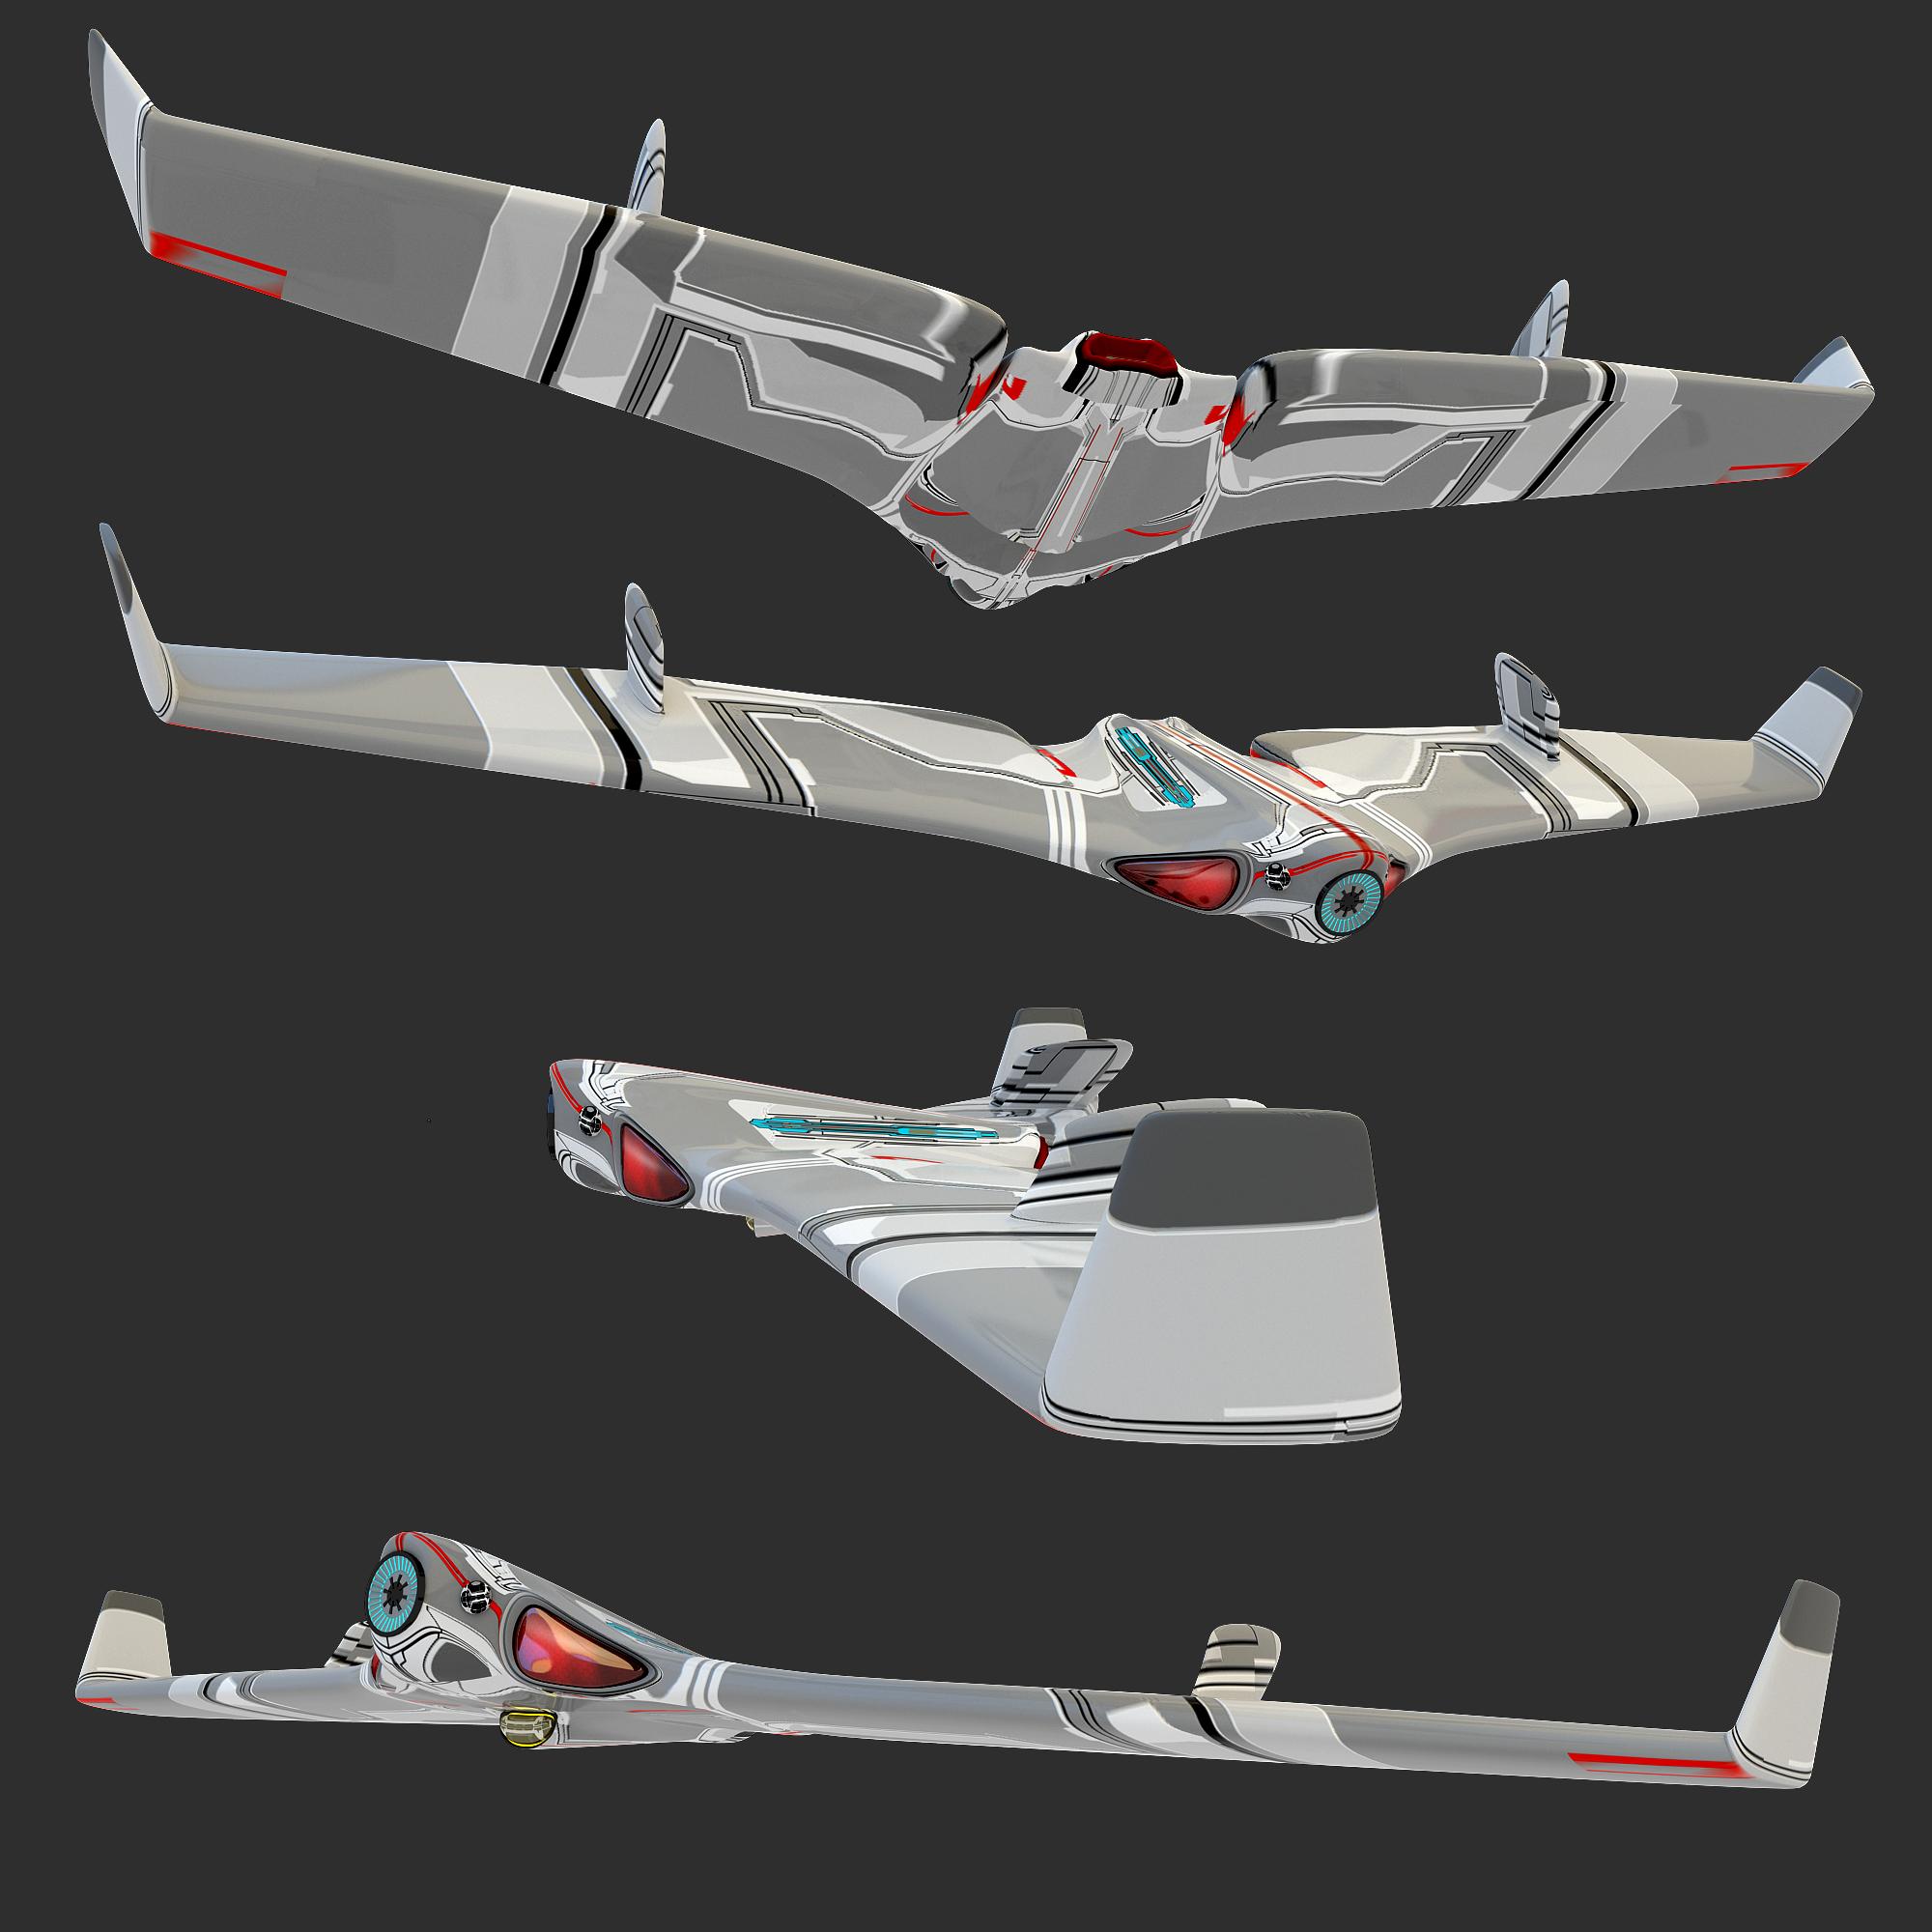 Tovarek-class FTR Drone